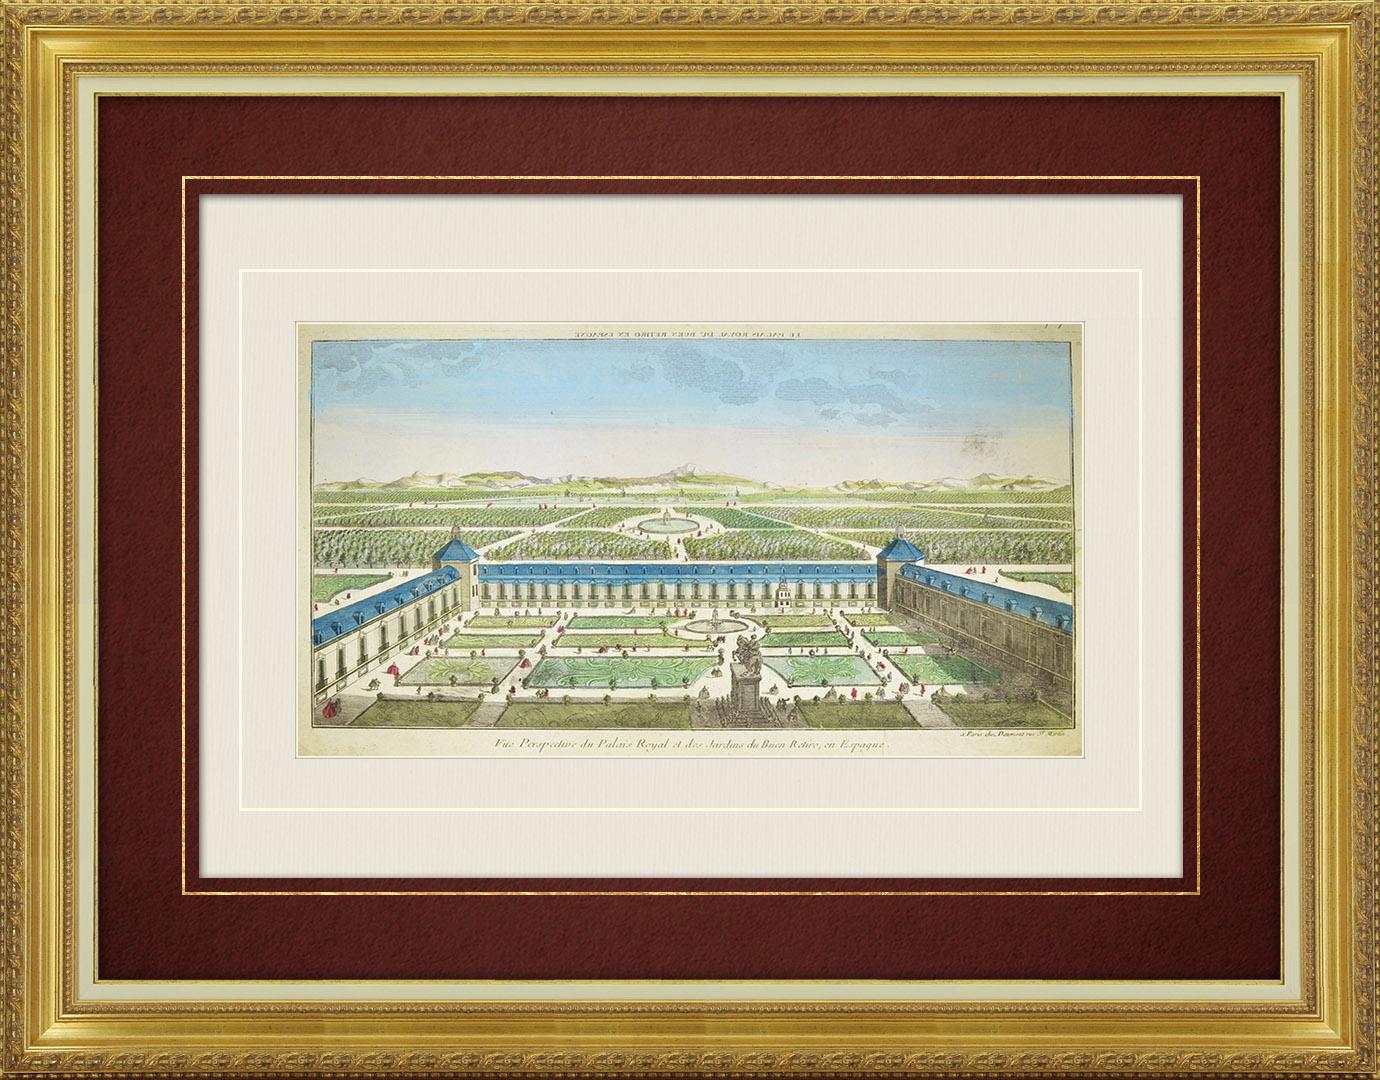 18th Century optical view in original watercolors of the Buen Retiro Palace in Madrid (Spain)